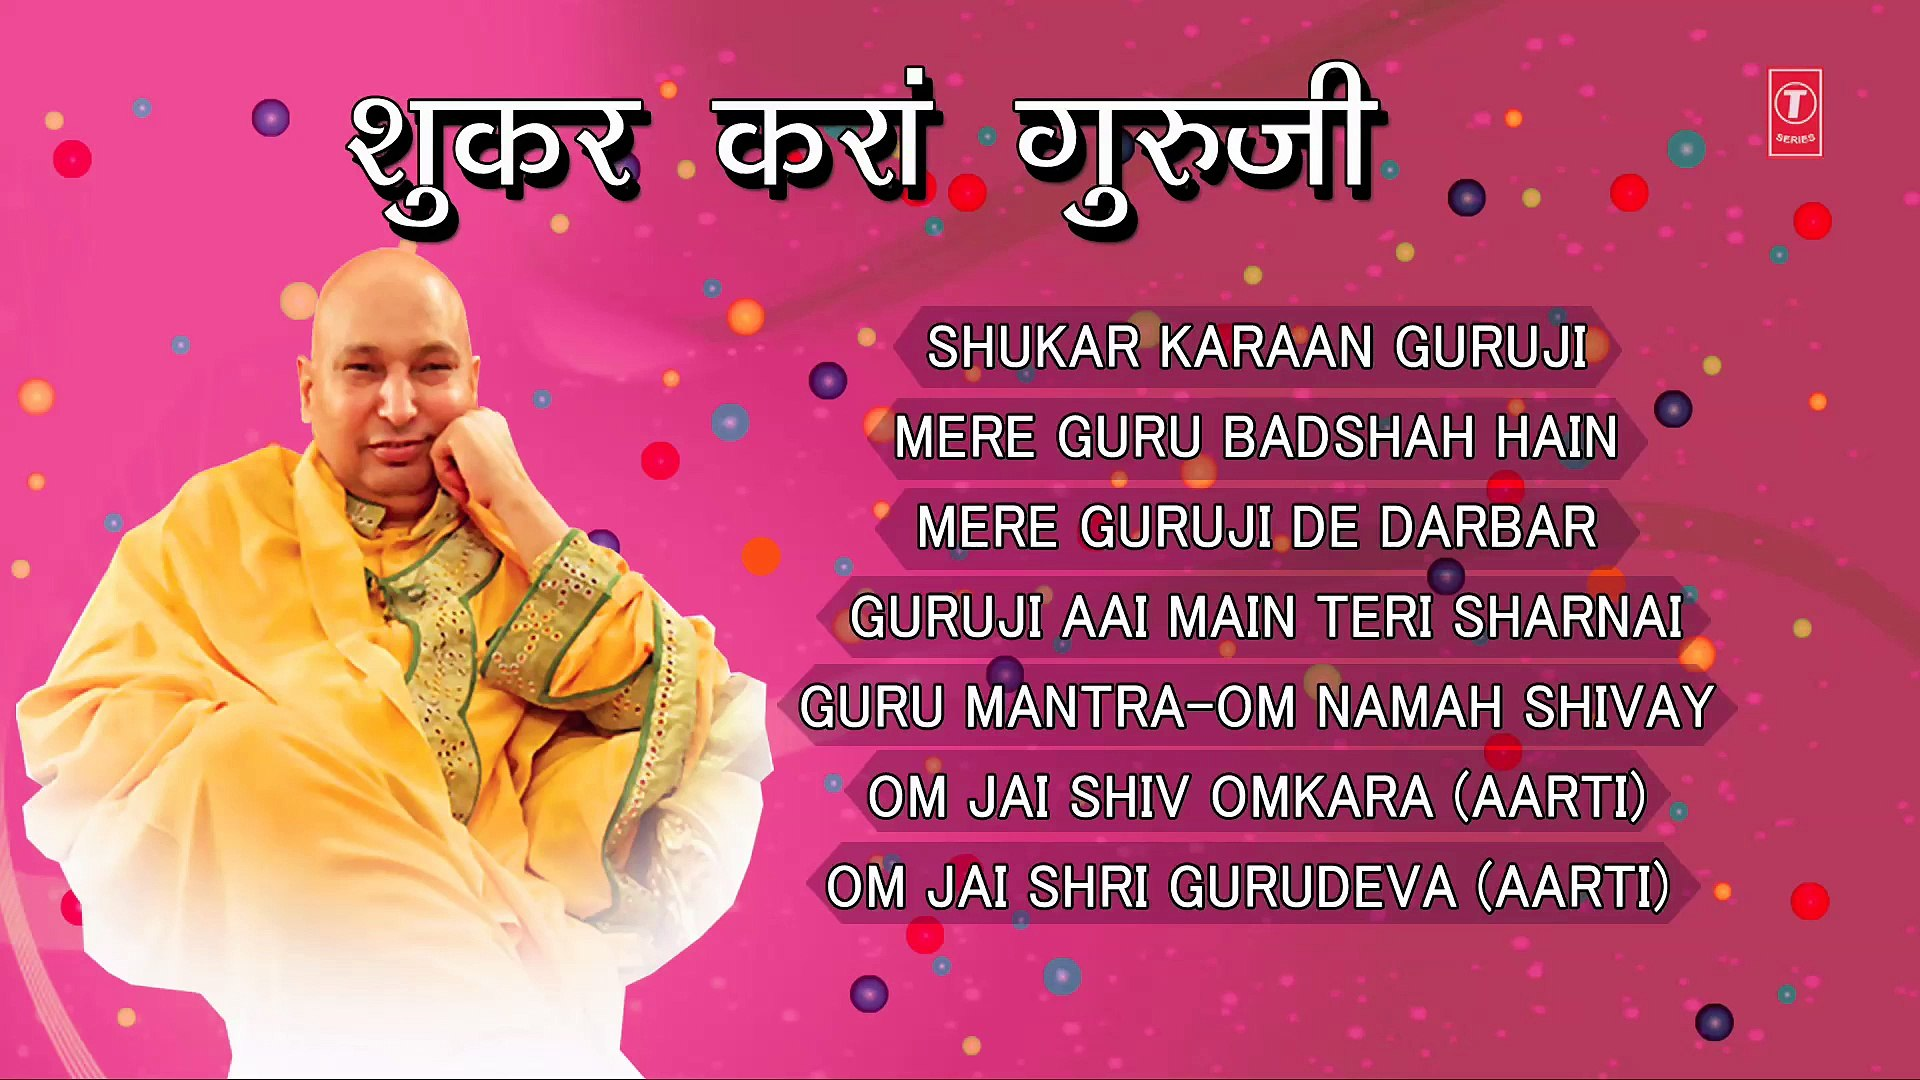 Shukar Kara Guruji Guru Bhajans By Sonia Arora [Full Audio Songs Juke Box]